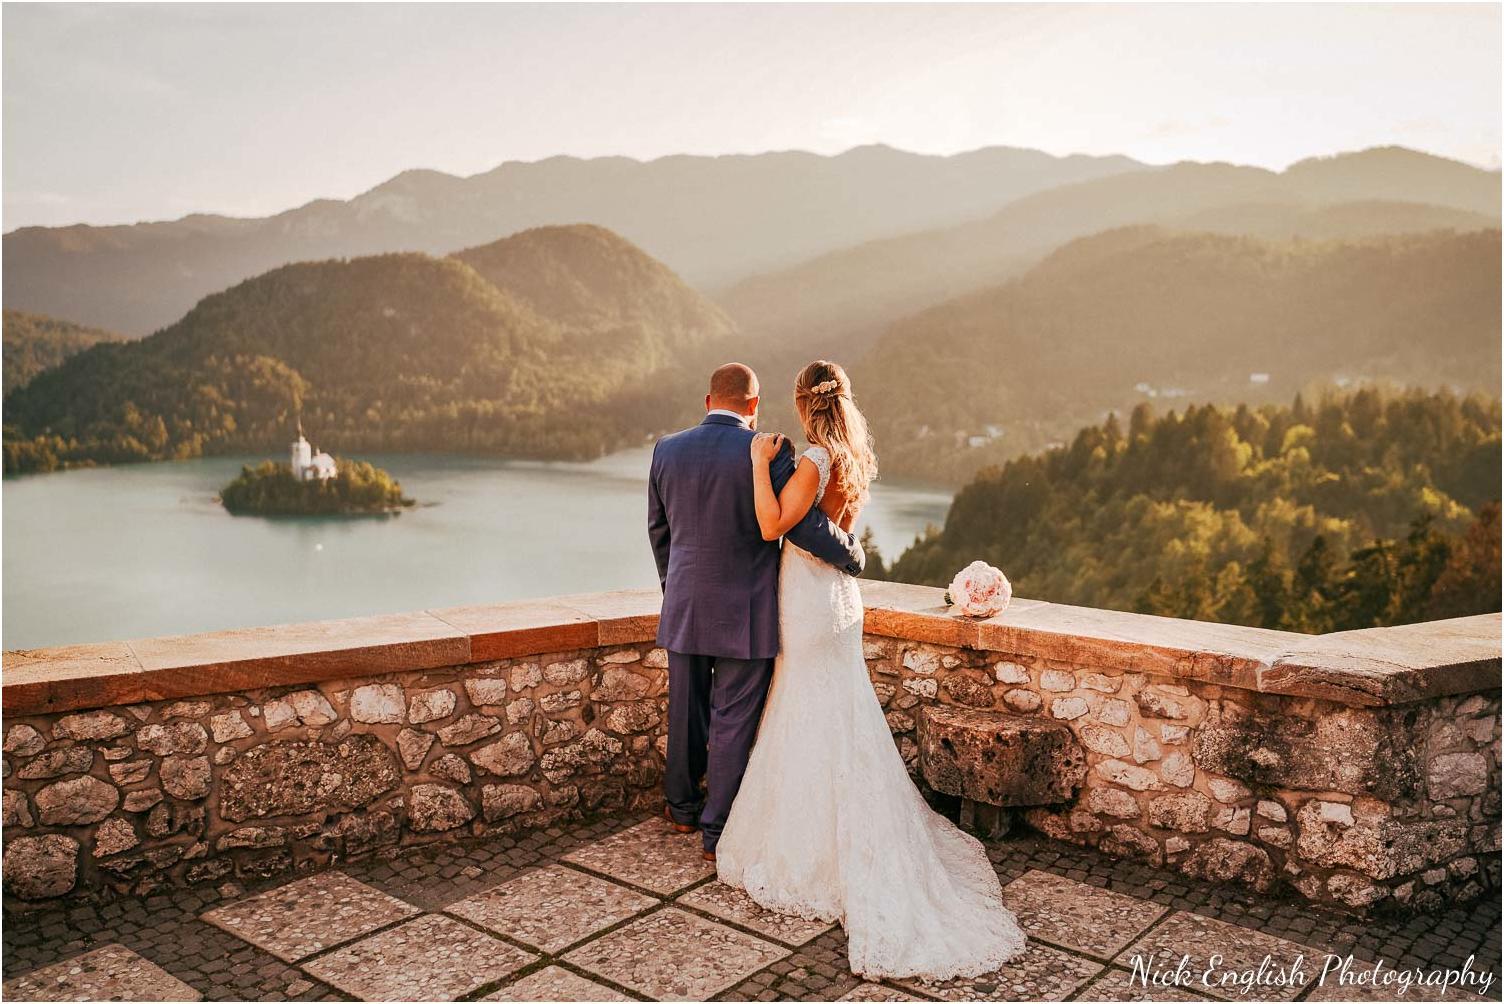 Destination_Wedding_Photographer_Slovenia_Nick_English_Photography-70-33.jpg